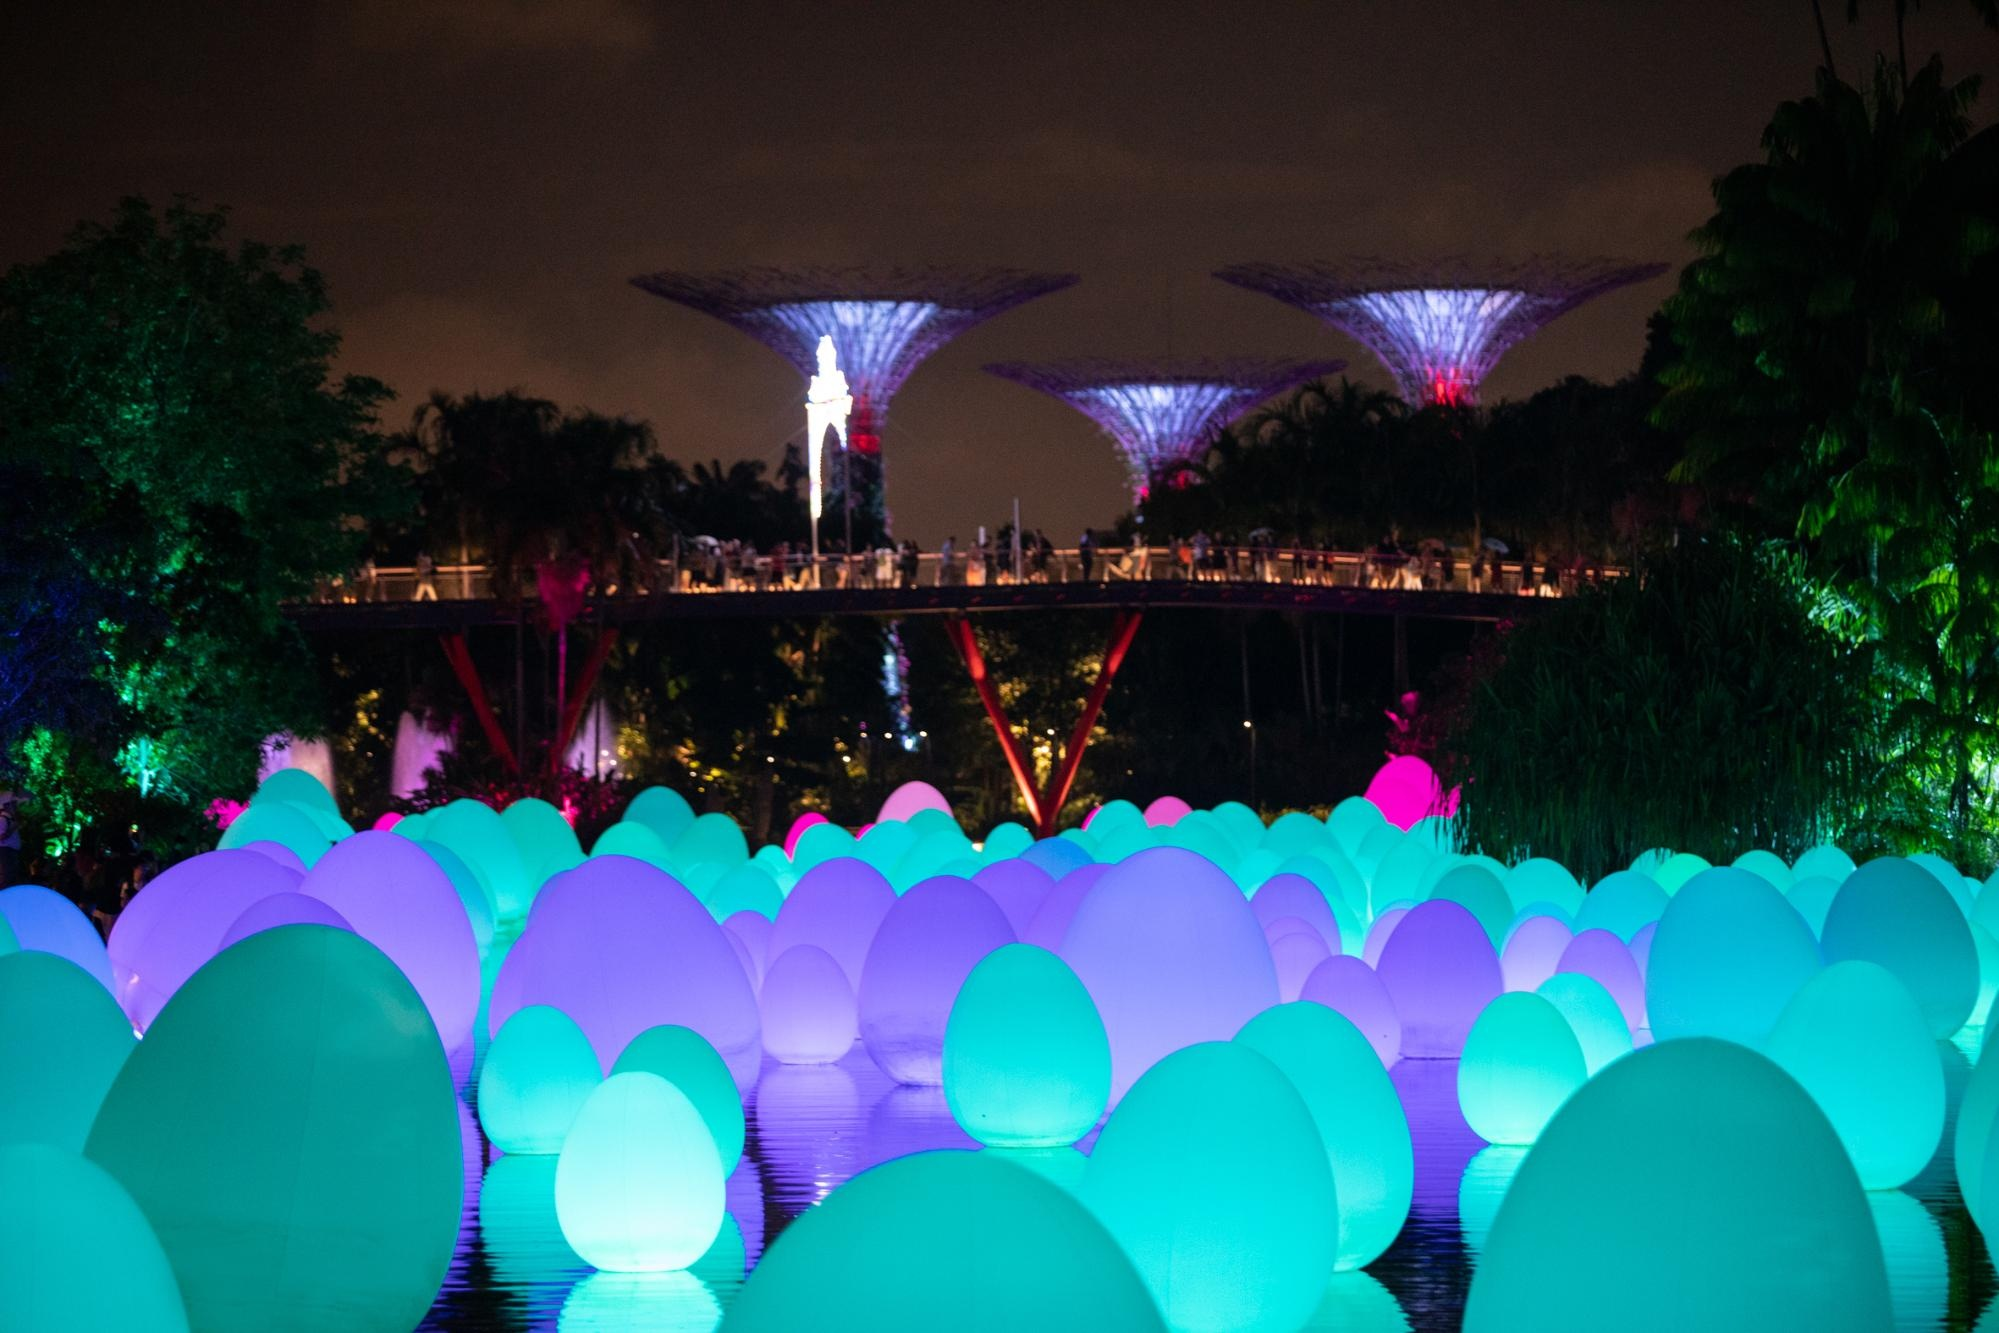 158426 1999x1333 - Gardens By The Bay Egg Light